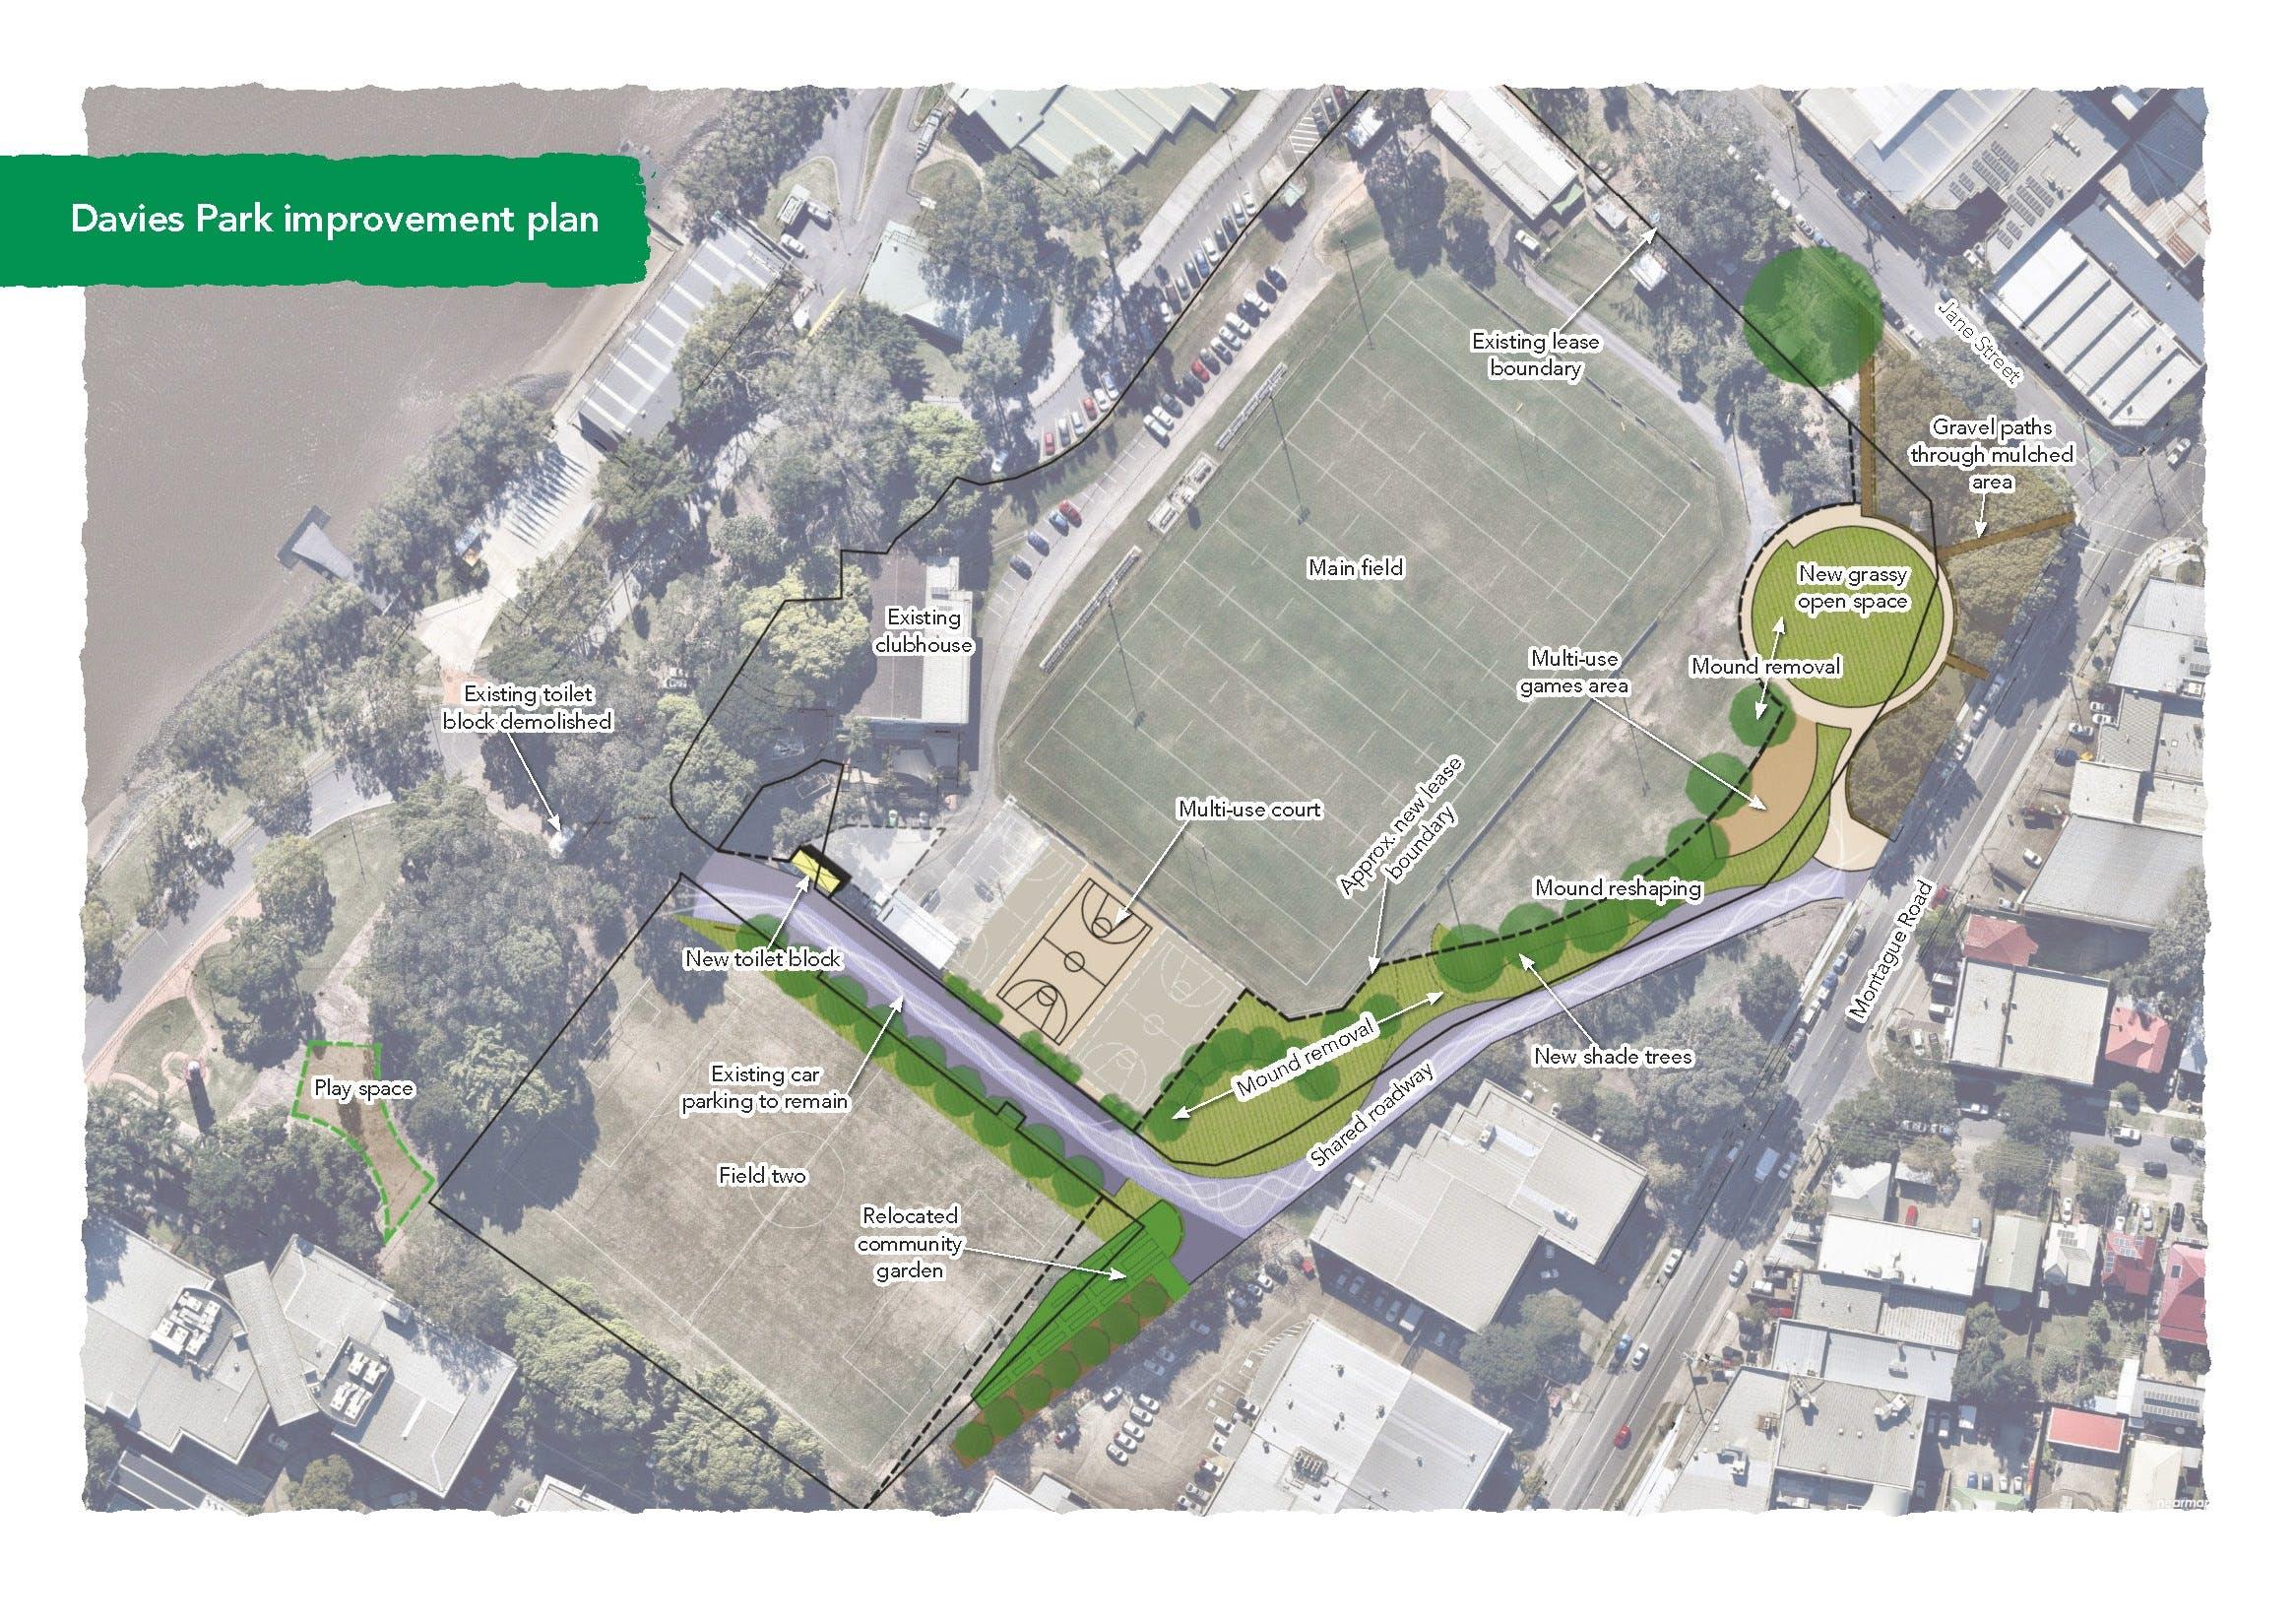 Davies Park improvement plan